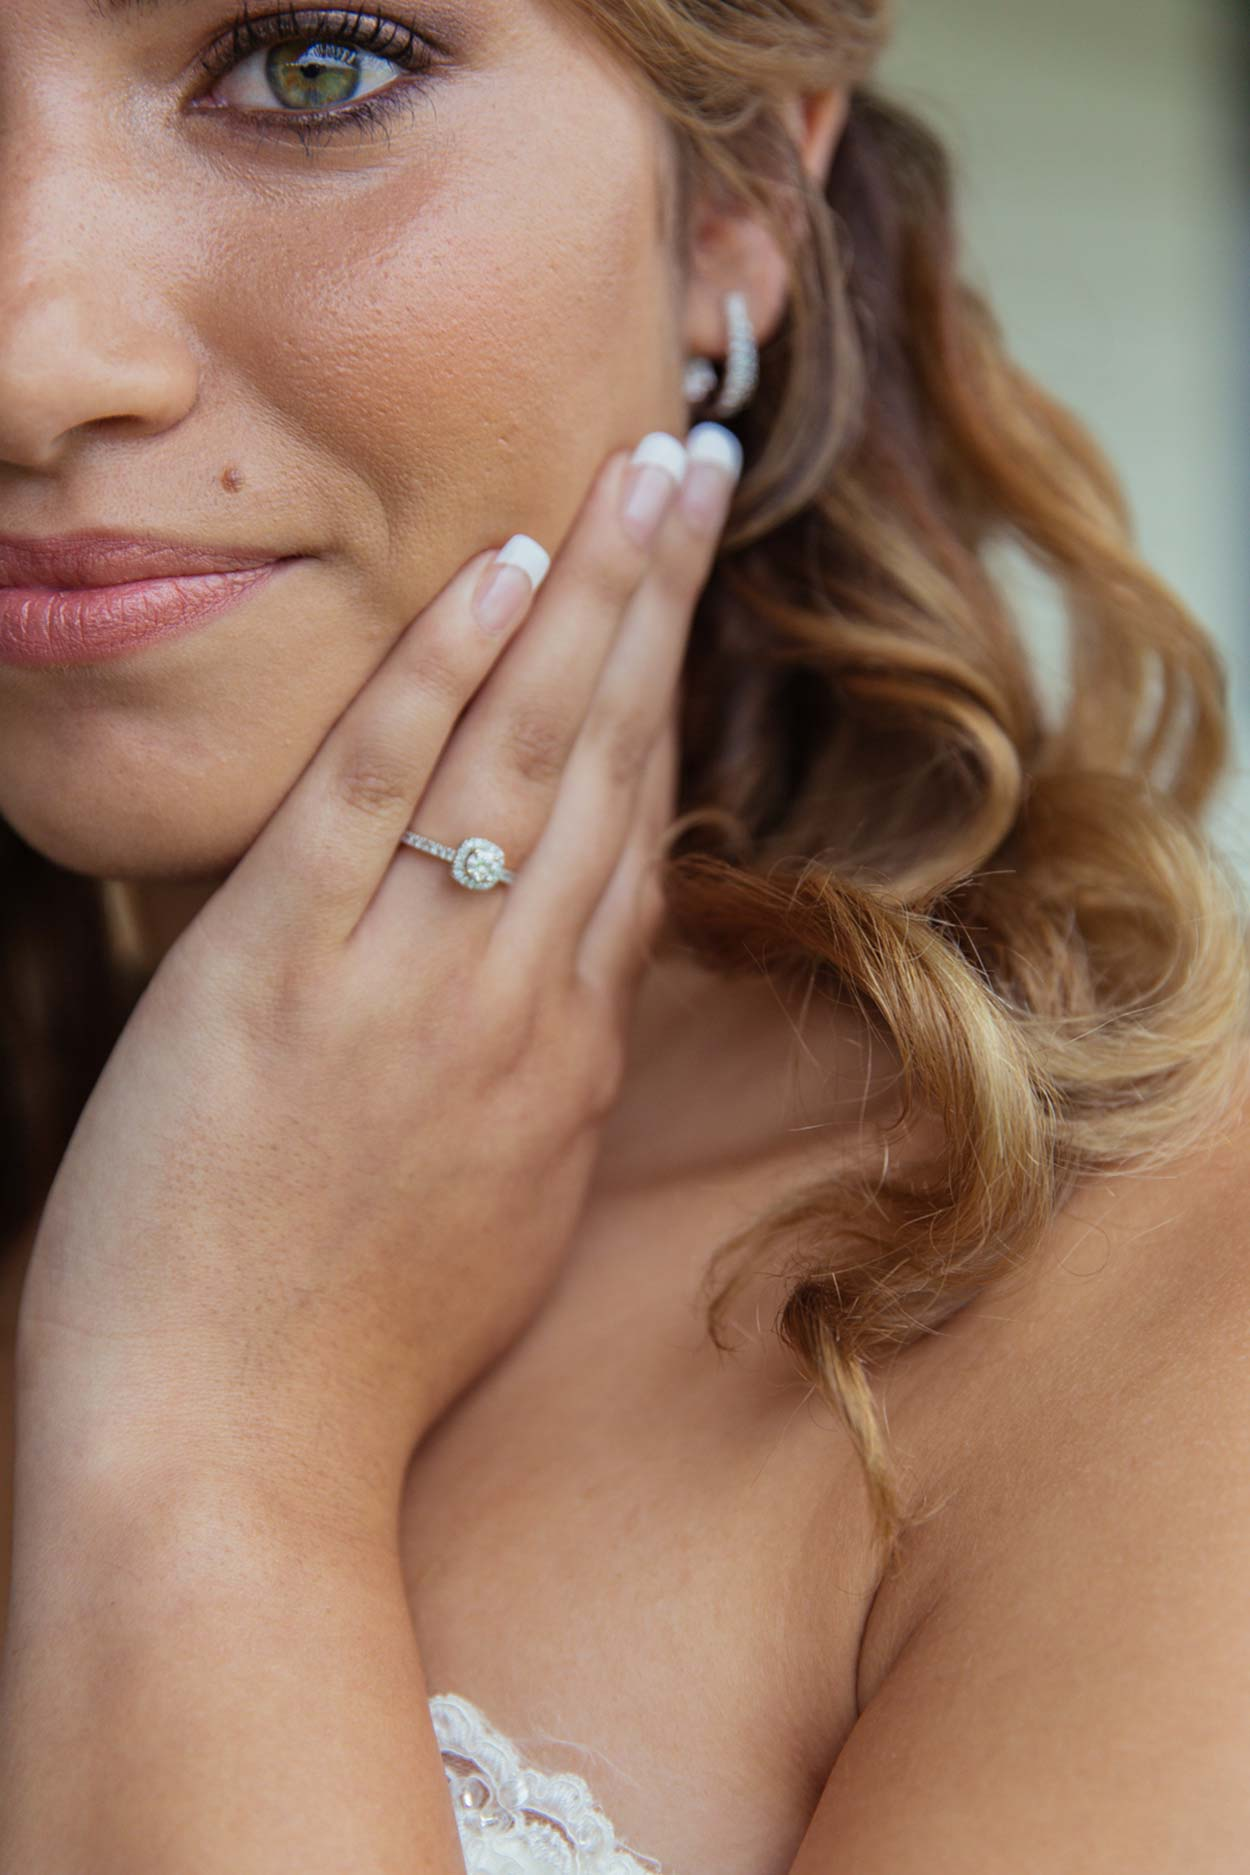 sunshine-coast-destination-wedding-photographers-brisbane-queensland-australian-maleny-noosa-beach-hinterland-montville-flaxton-gold-caloundra-elopement-photos-best-recommended-eco-friendly-packages-29.jpg